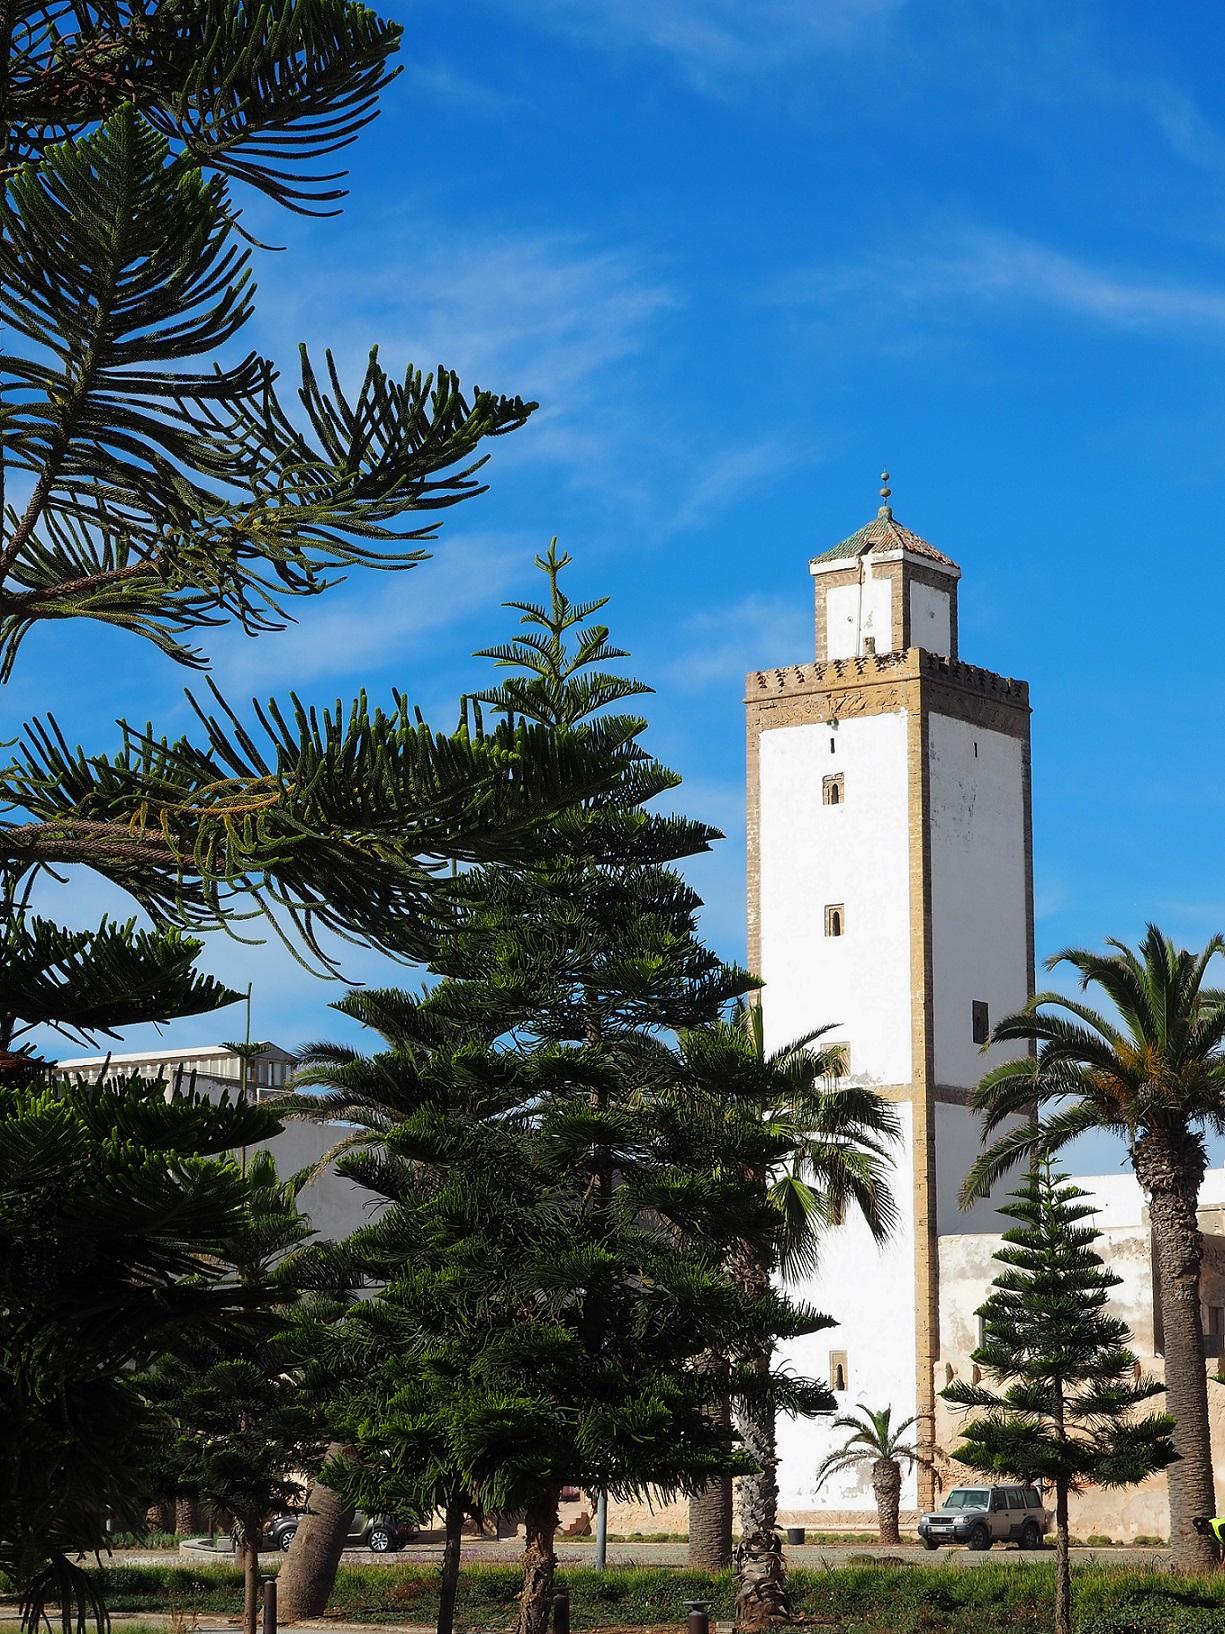 Une journée à Essaouira